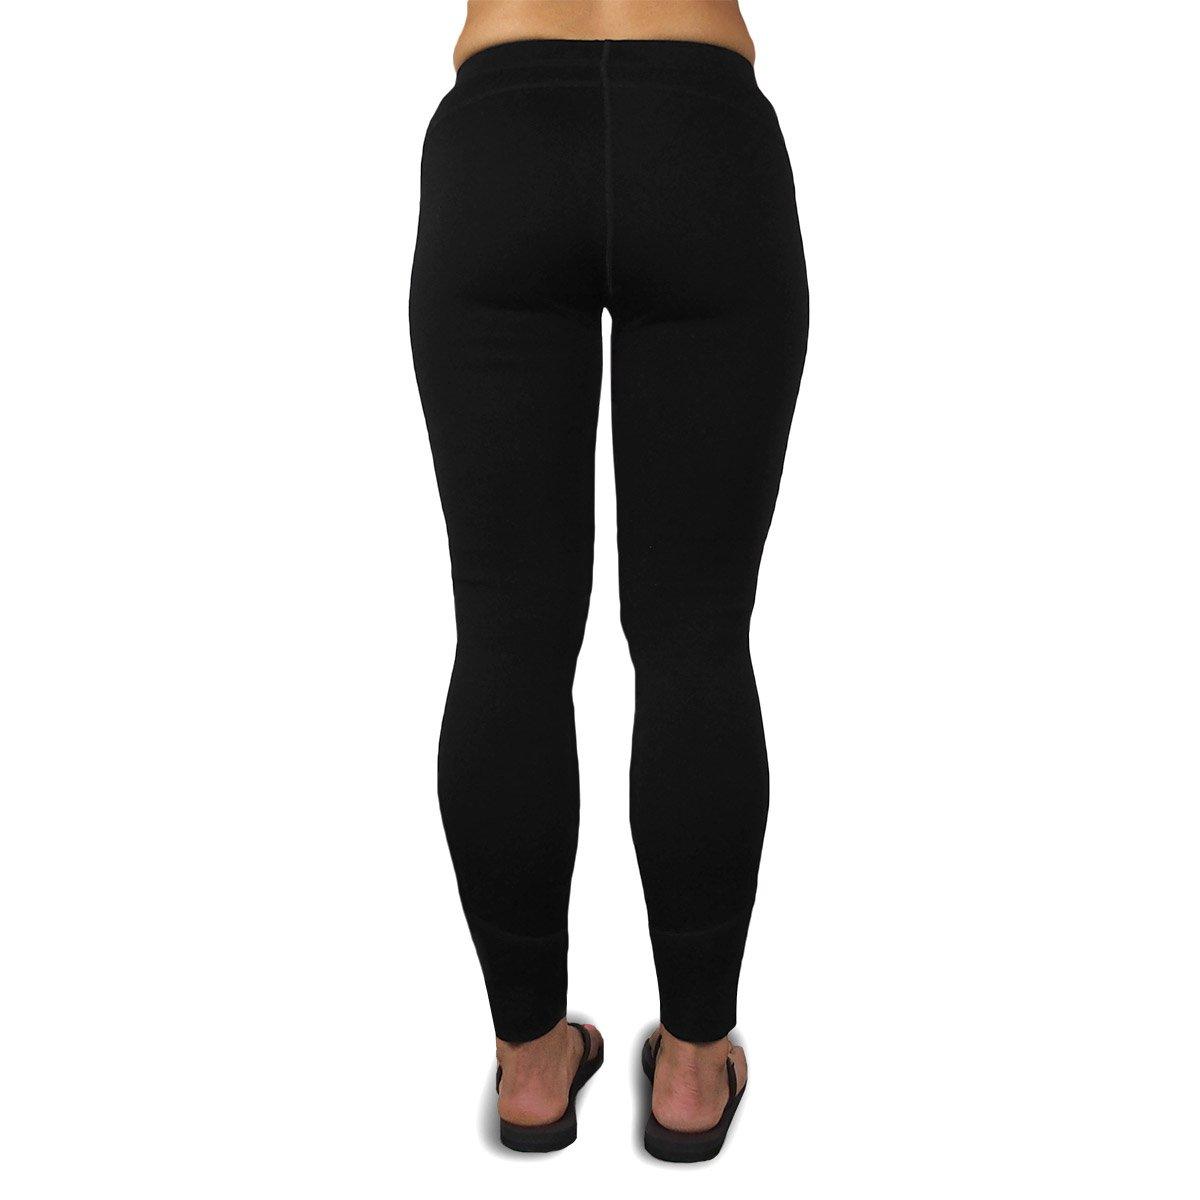 Minus33 Merino Wool 2300 Woolverino Women's Micro Weight Leggings Black Large by Minus33 Merino Wool (Image #4)